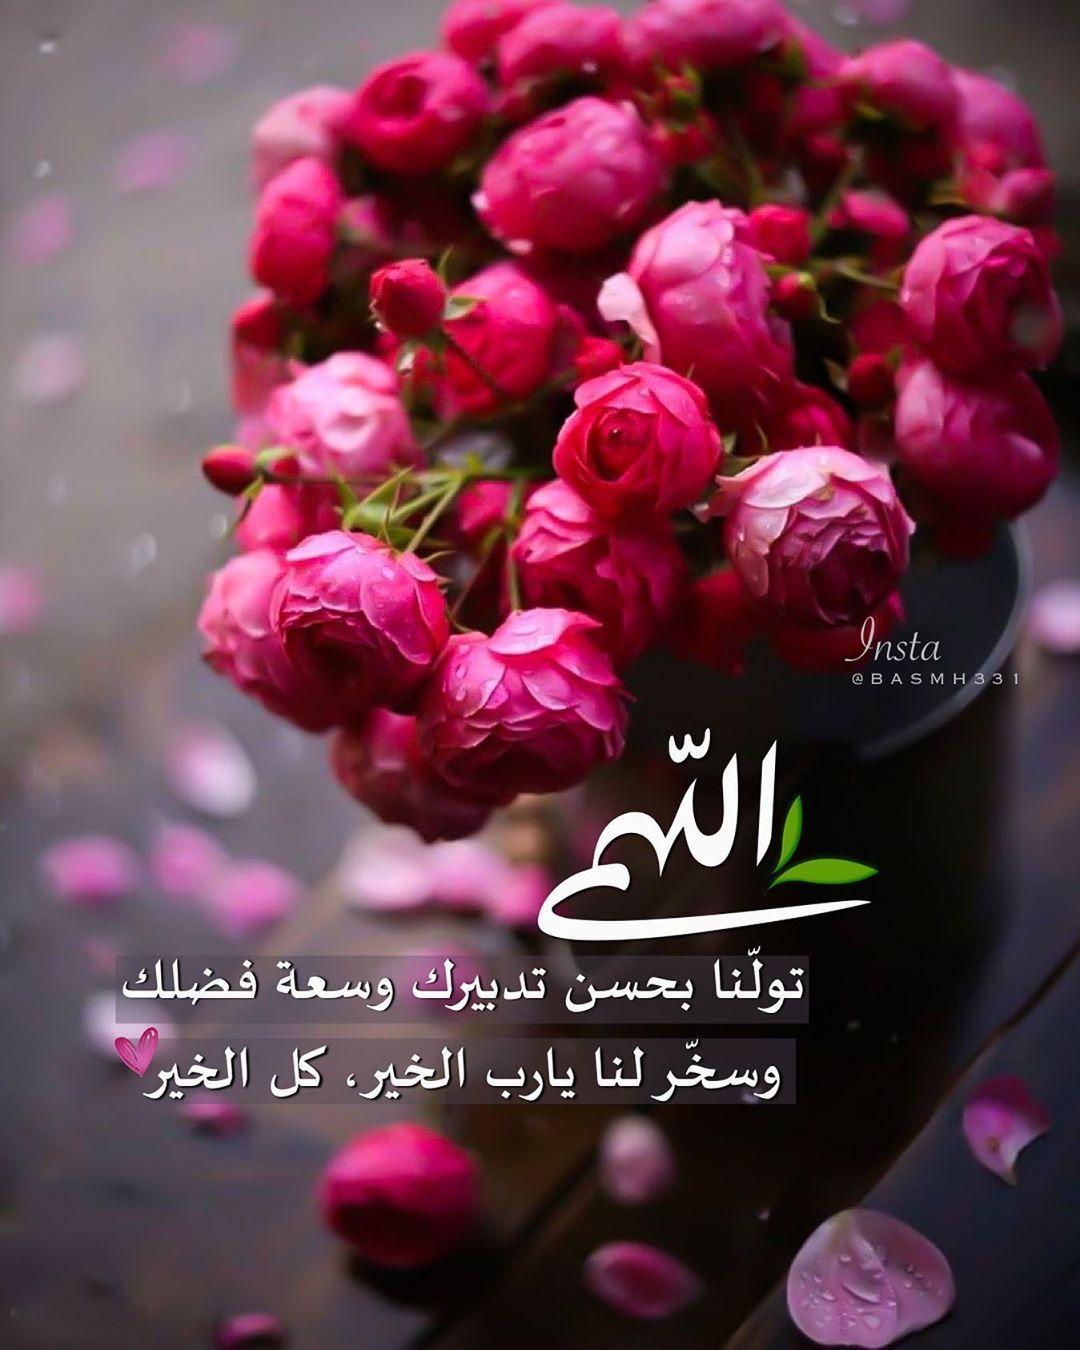 1 094 Likes 20 Comments بسـمه الحازمي Basmh331 On Instagram يارب Beautiful Morning Messages Good Morning Gif Good Morning Greetings